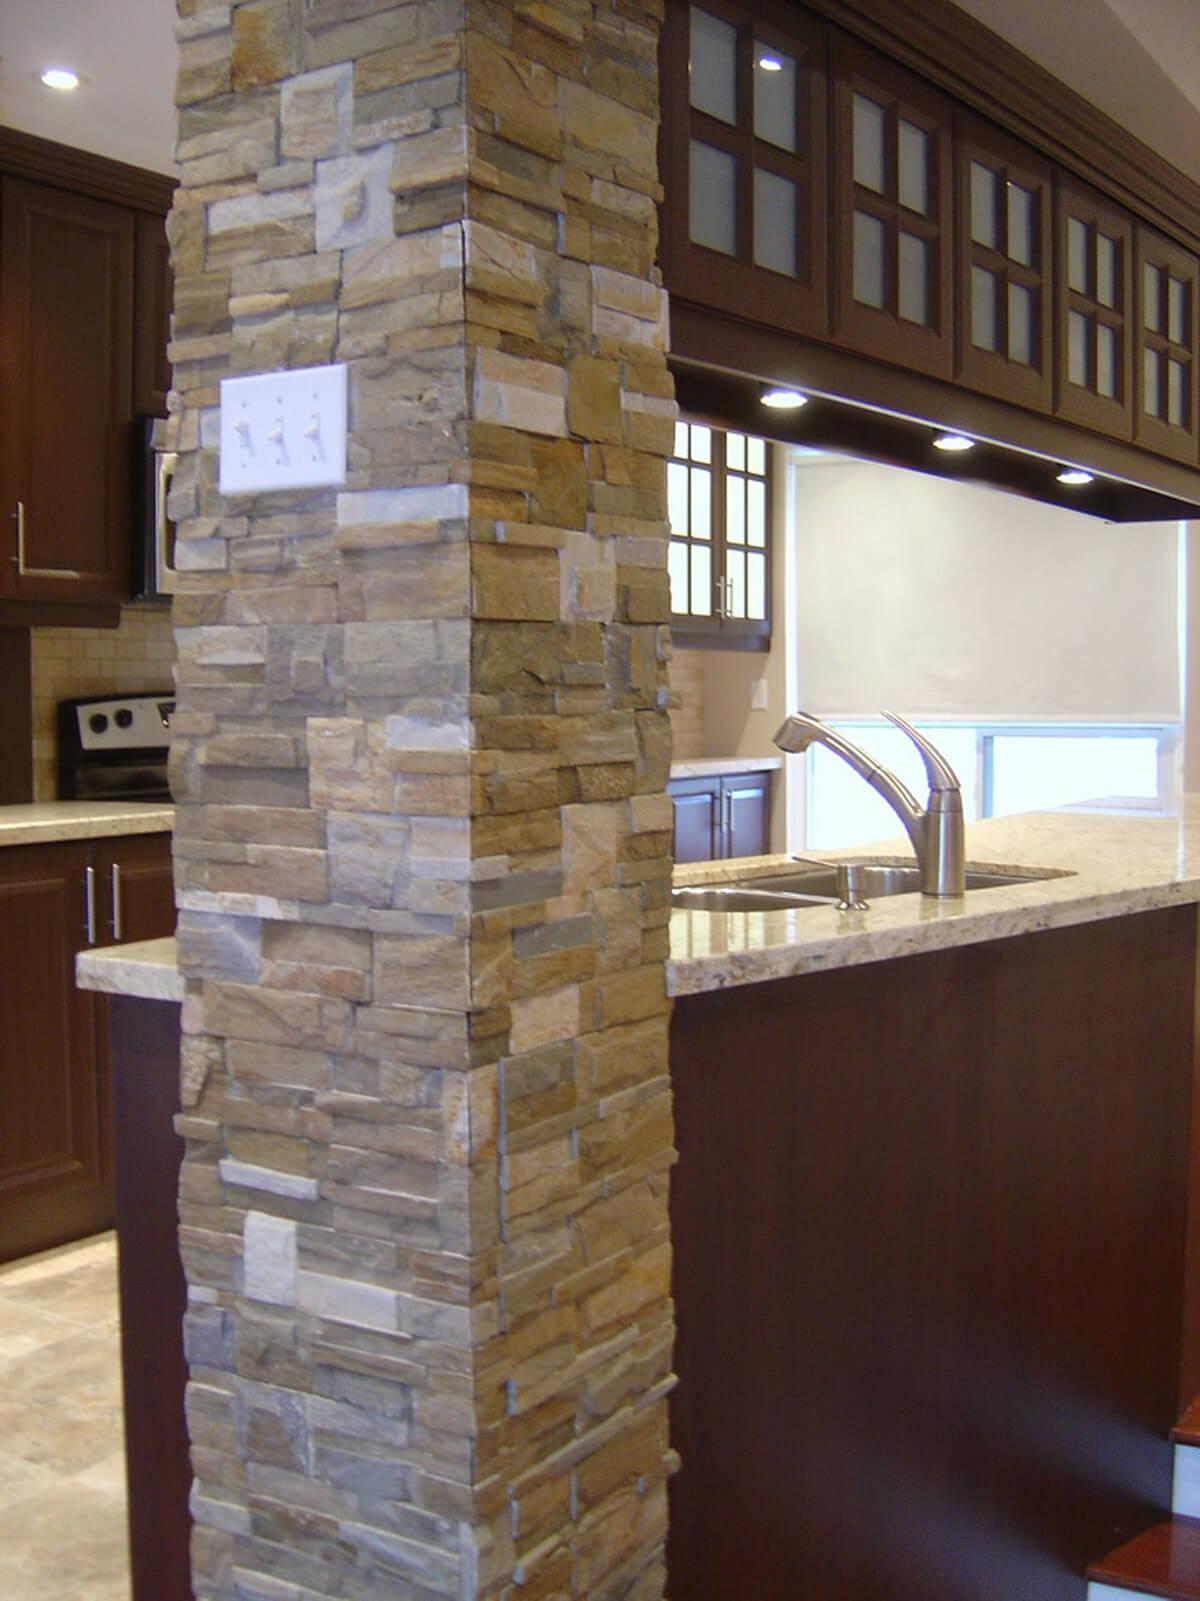 Interior Stone Veneer >> Interior Stone Veneer - Townhouse, Mississauga - Building Blocks Construction